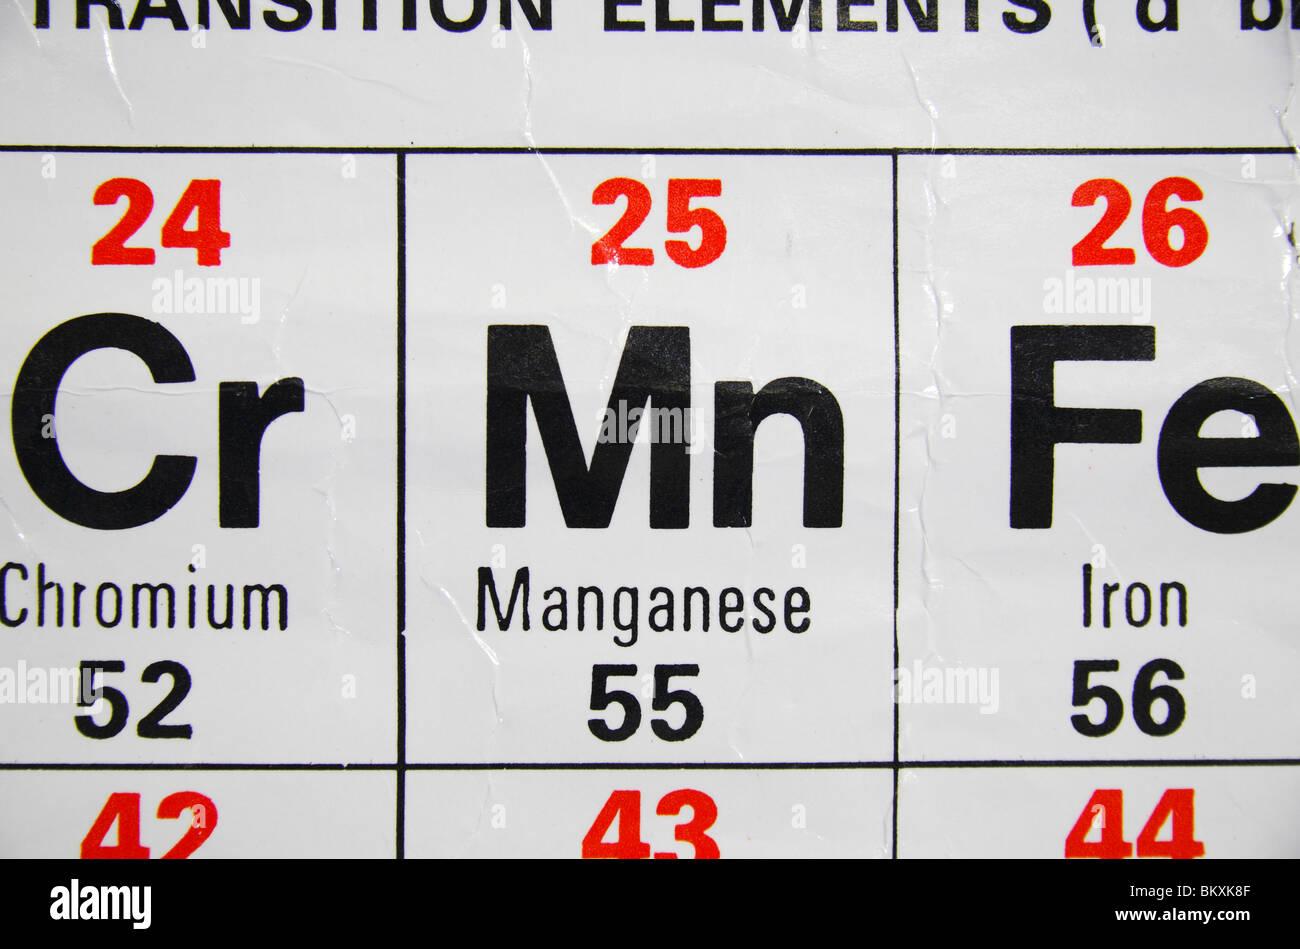 Chromium on periodic table gallery periodic table images manganese on periodic table choice image periodic table images close up view of a standard uk gamestrikefo Choice Image